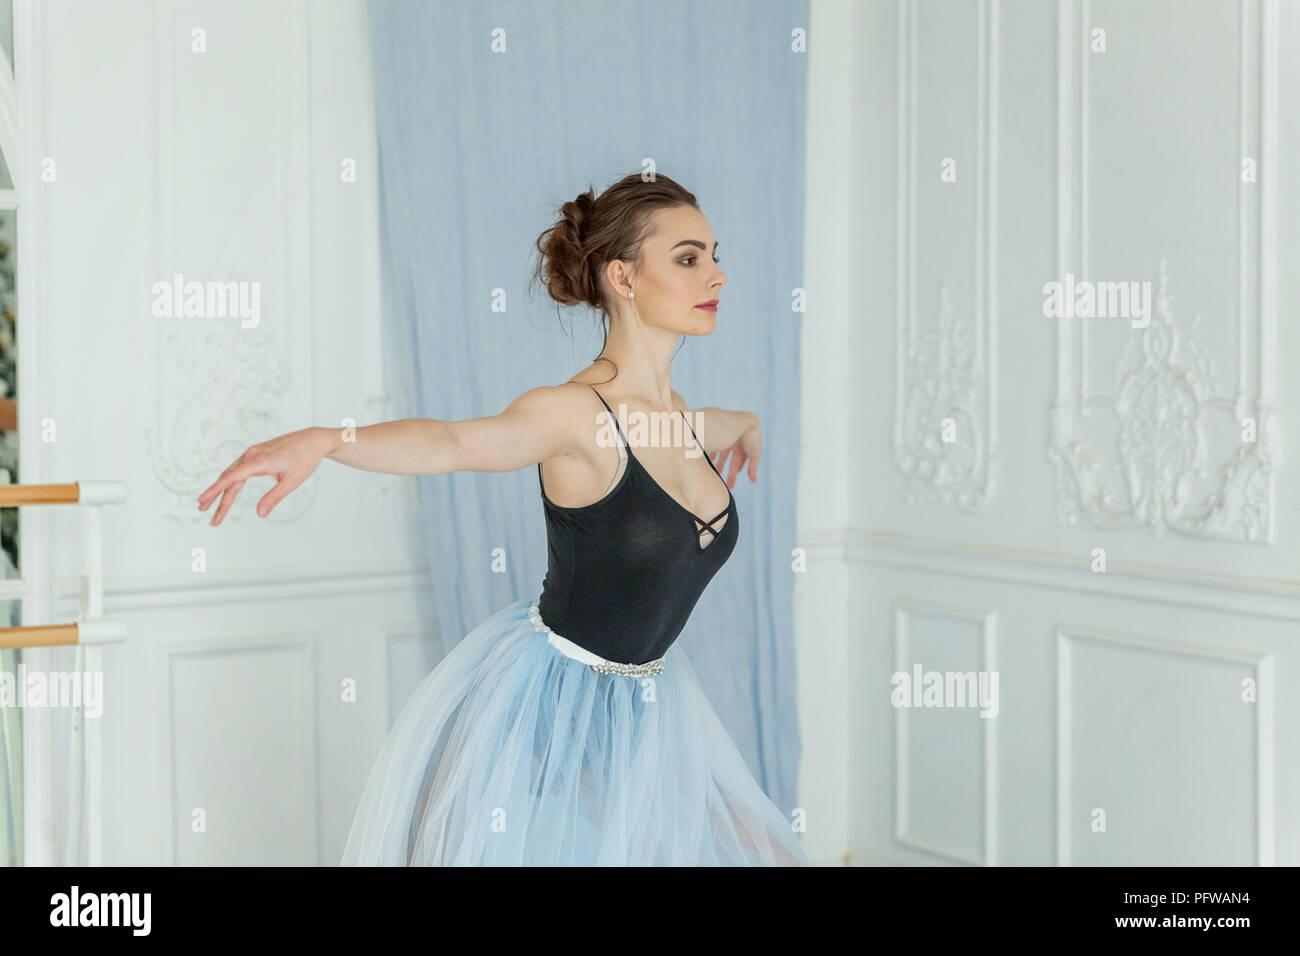 Bailarina De Silueta Imágenes De Stock & Bailarina De